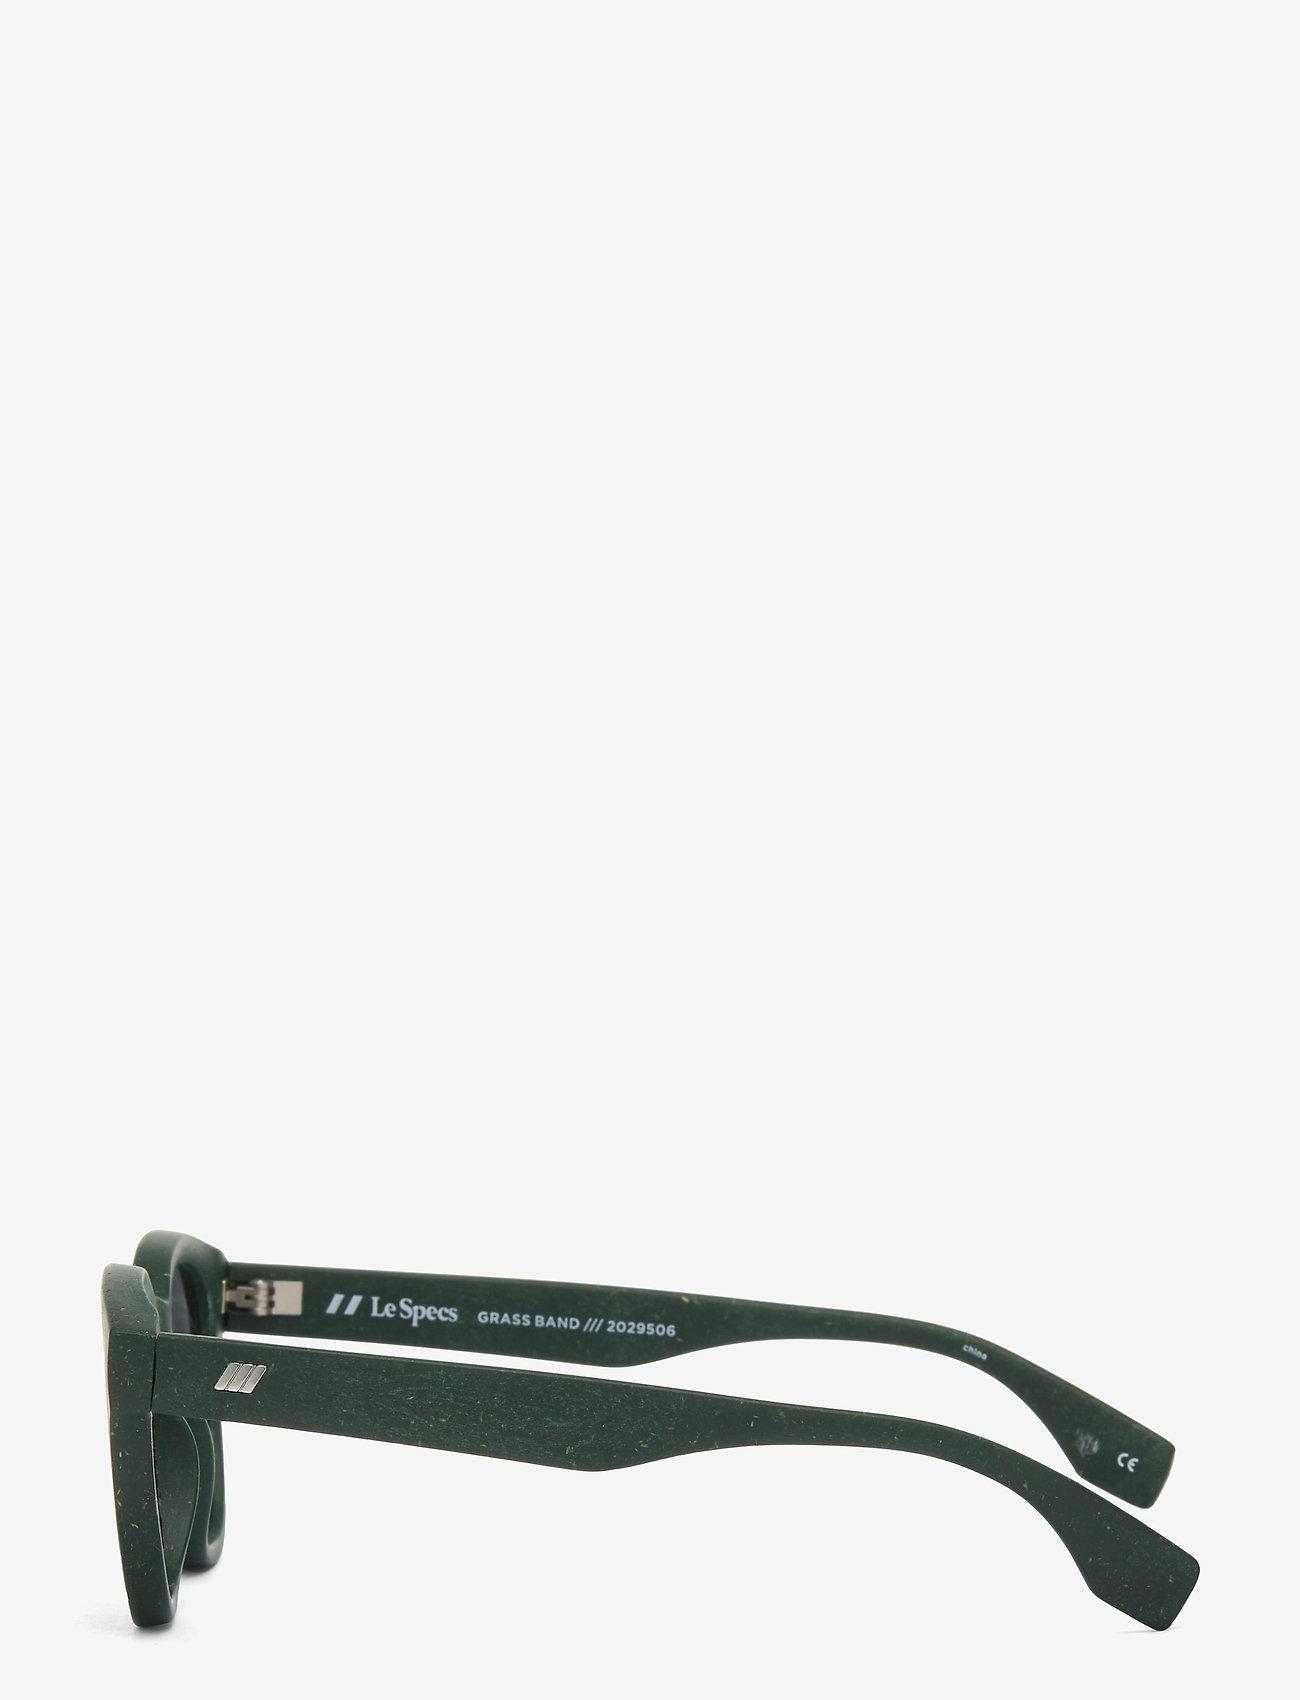 Le Specs - LE SUSTAIN - GRASS BAND - rond model - khaki grass w/ smoke mono lens - 2